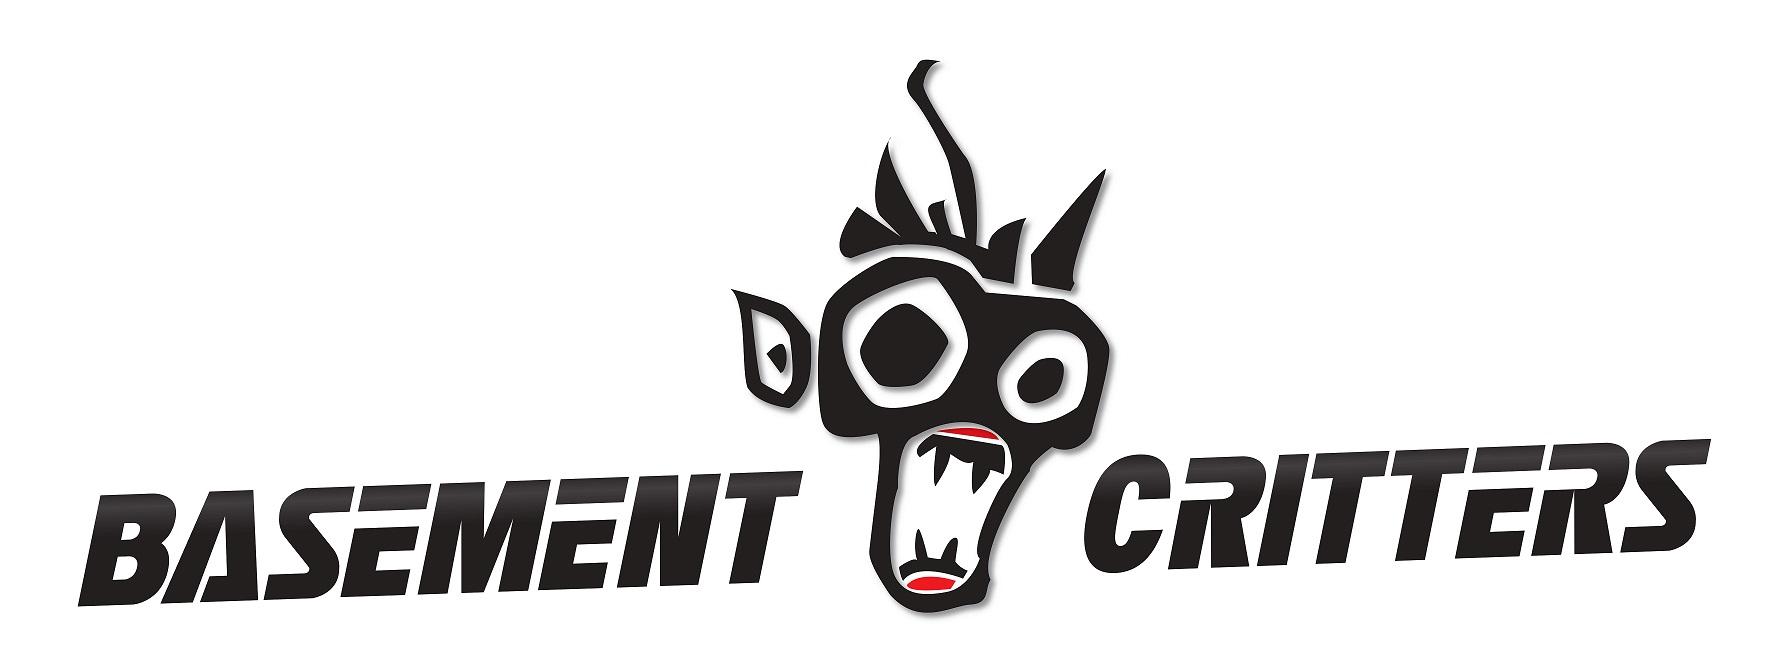 Basement Critters